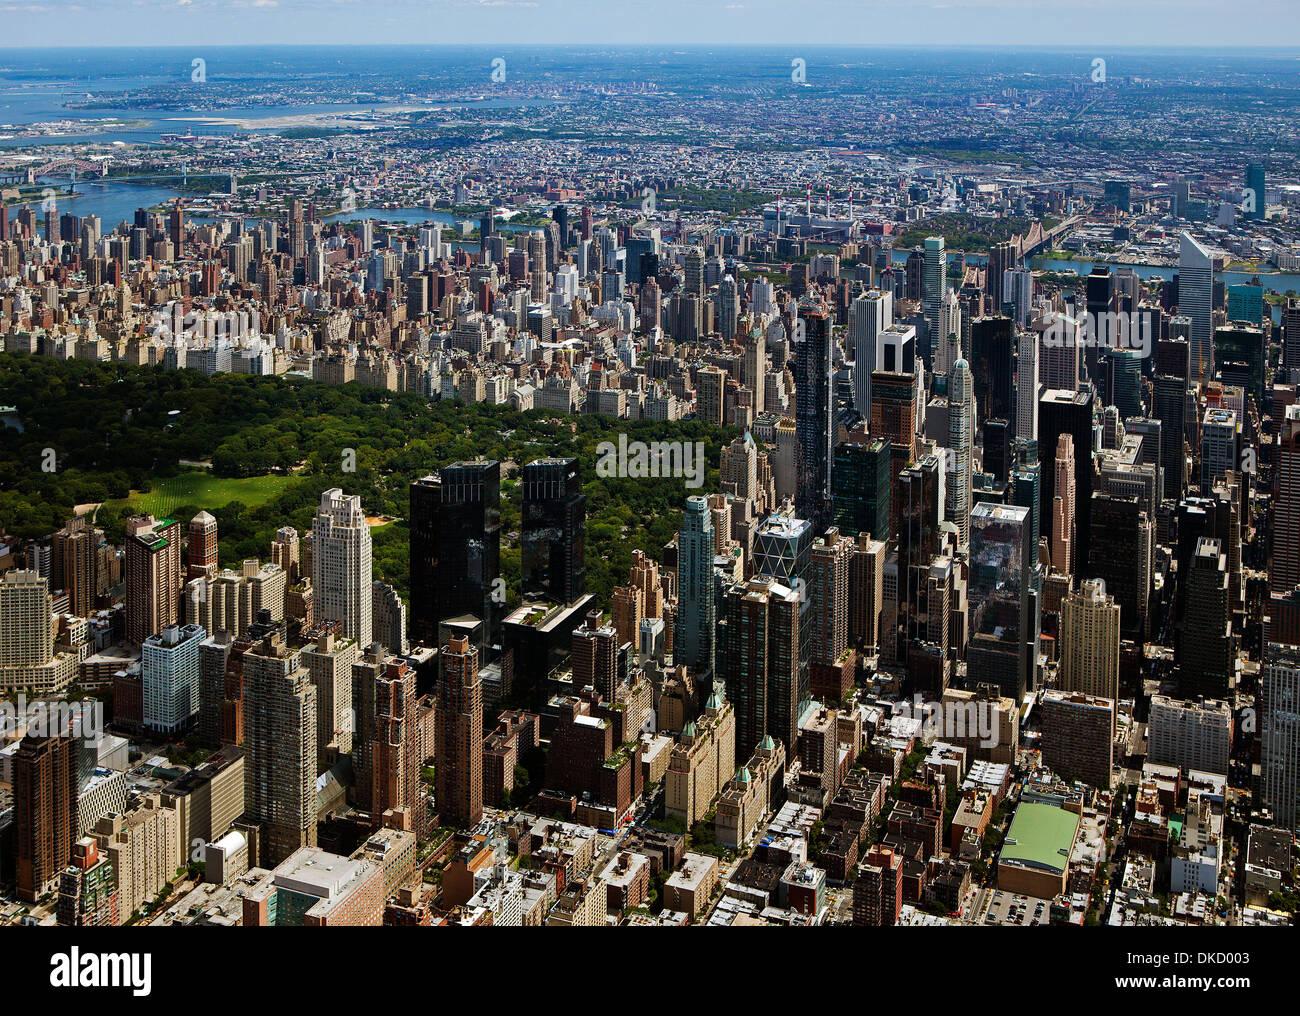 aerial photograph Central Park, Manhattan, New York City - Stock Image